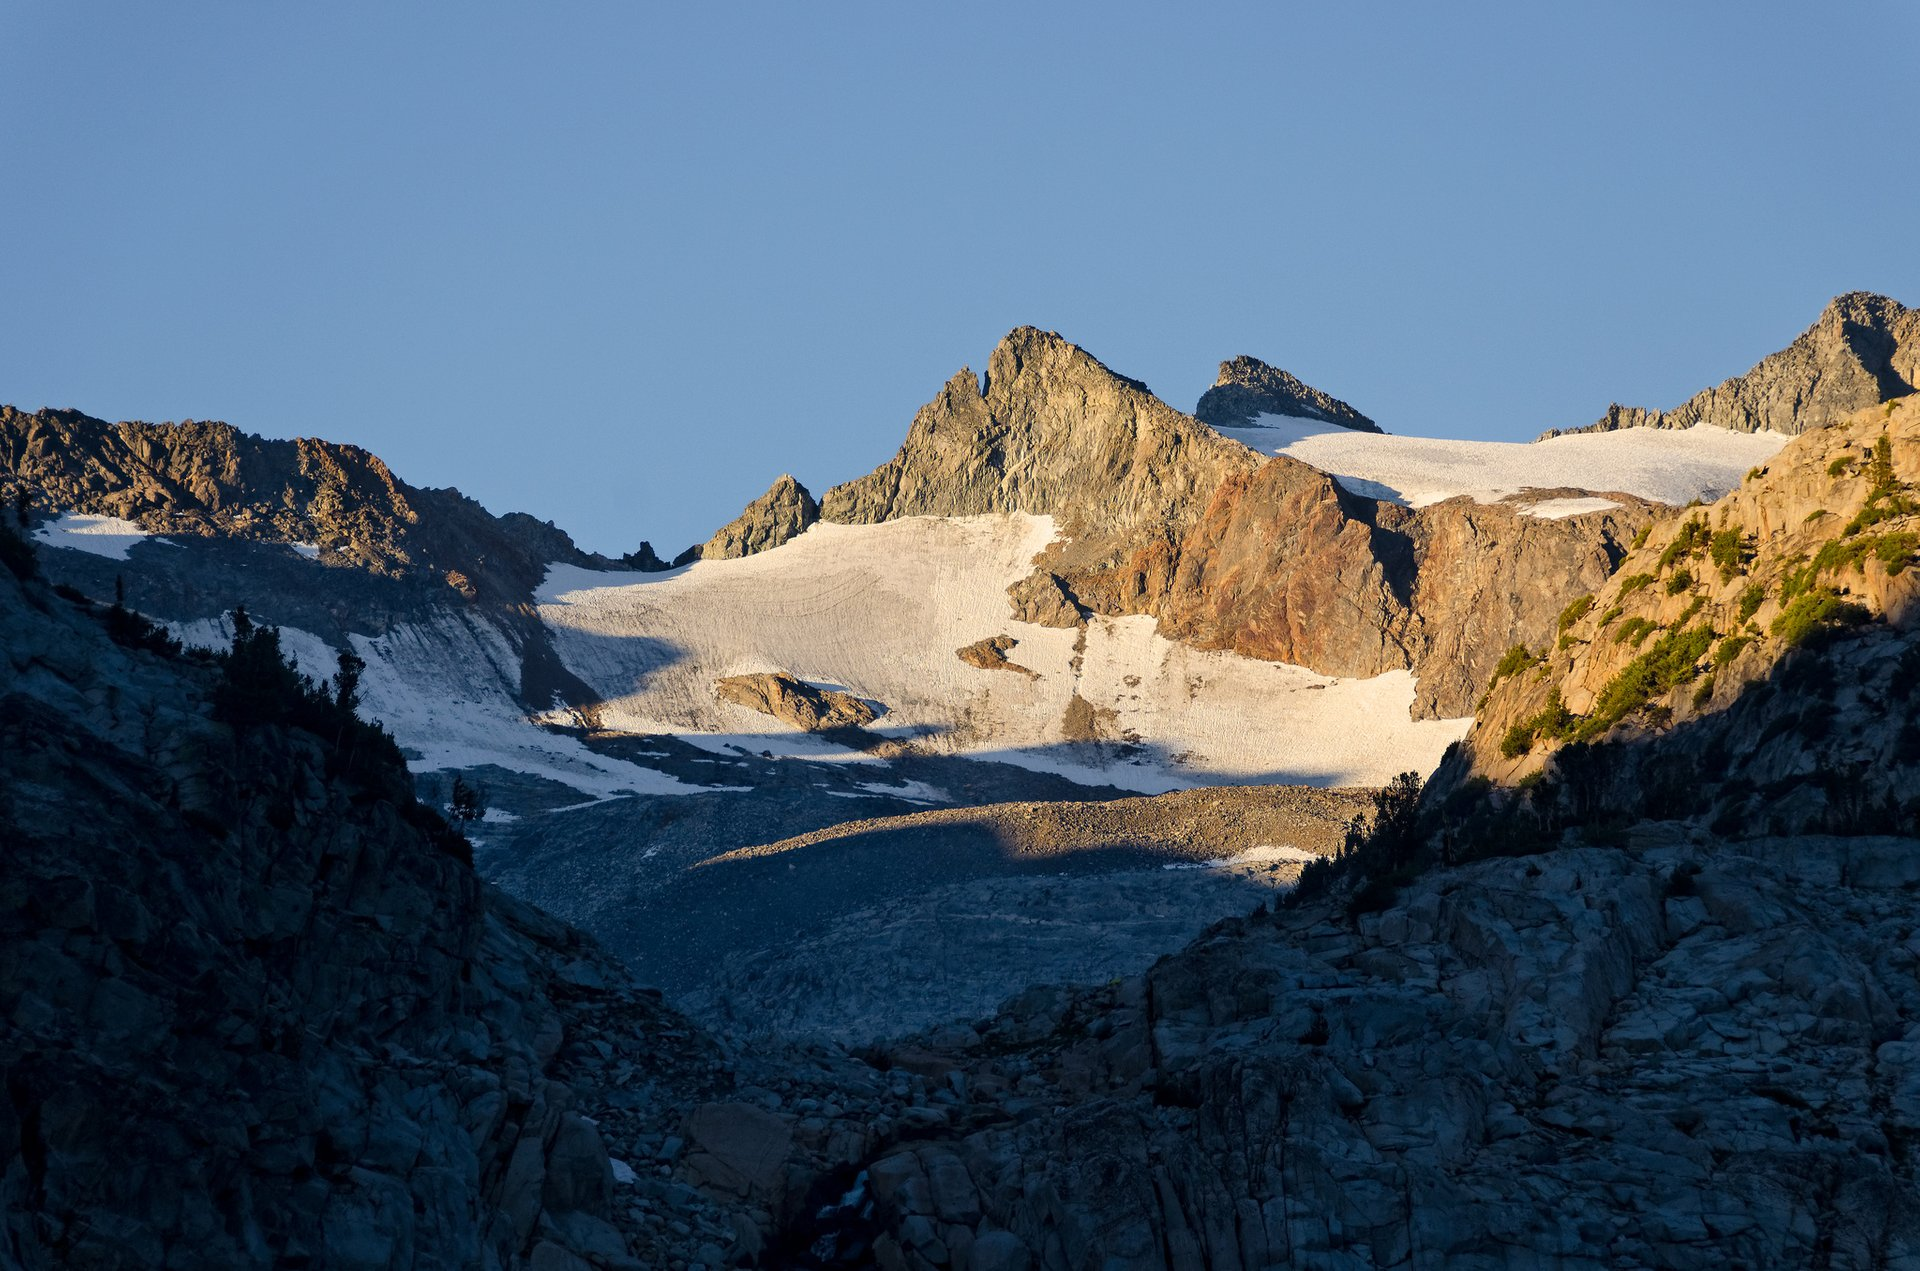 Lyell glaciers 2020